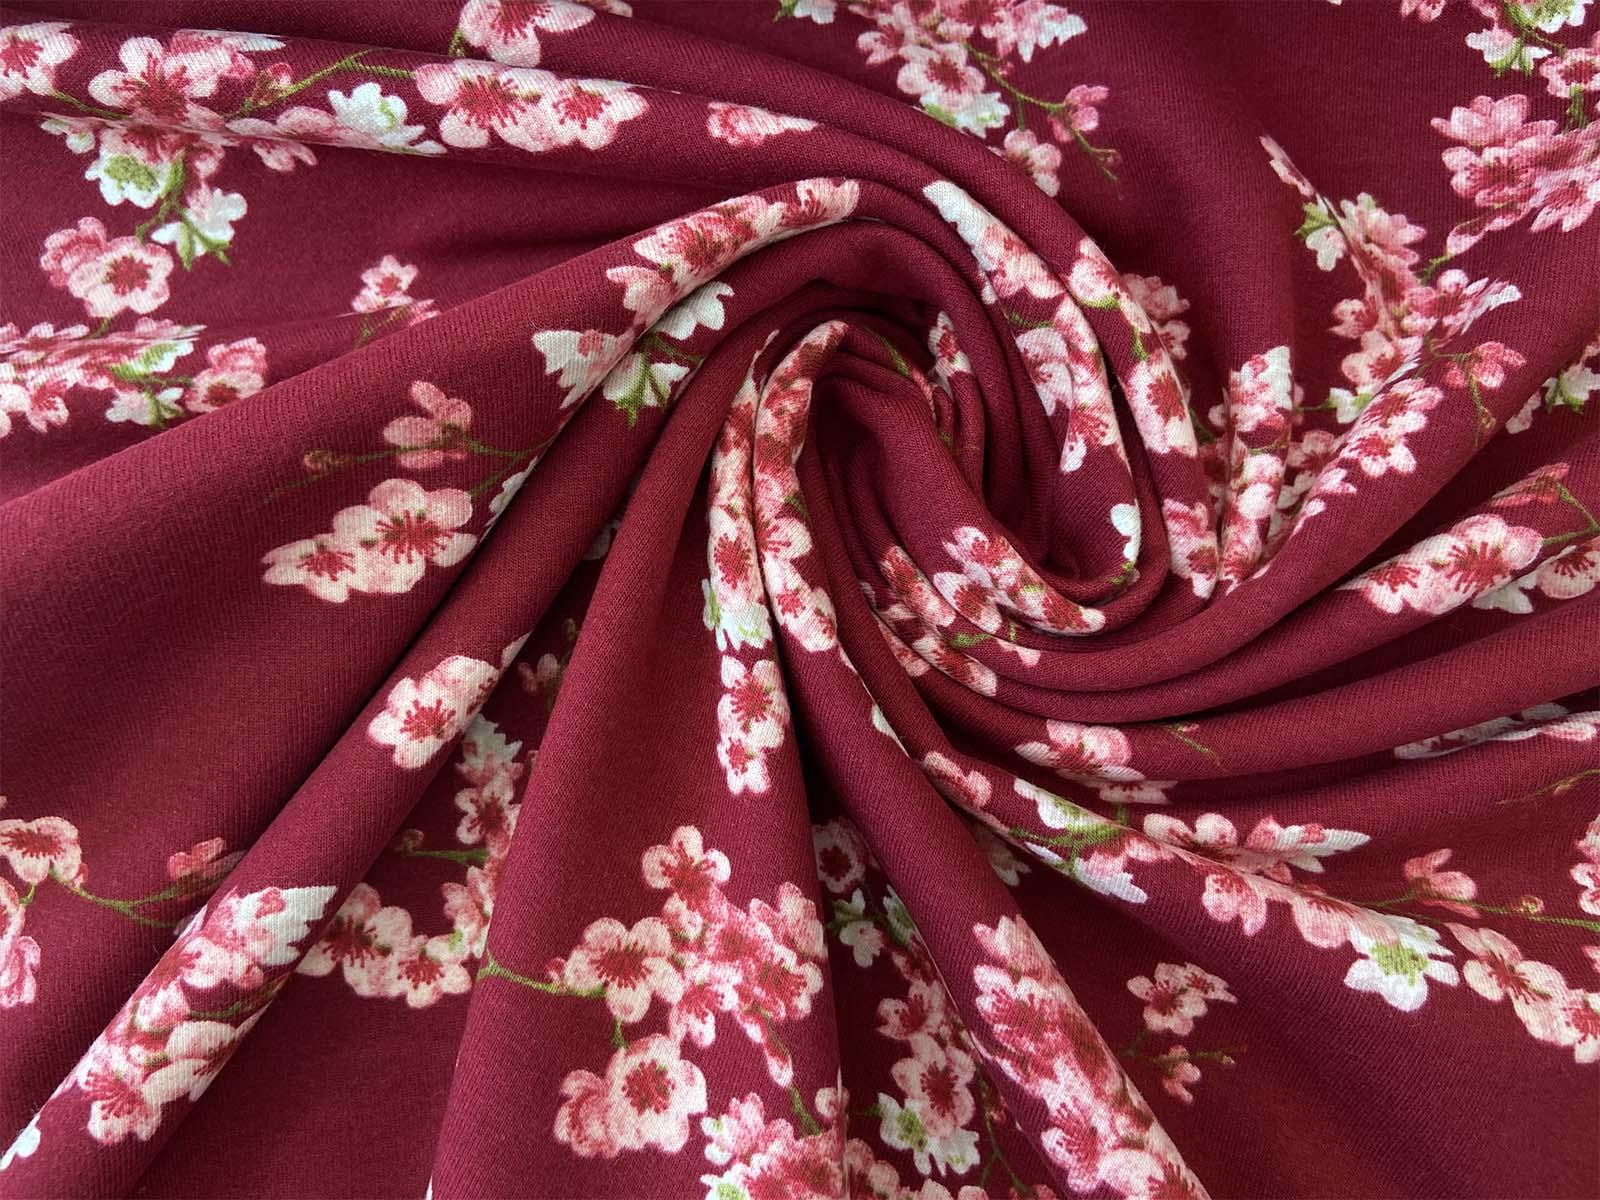 Bio-Sweat - Cherry Blossom weinrot designed by Poppy